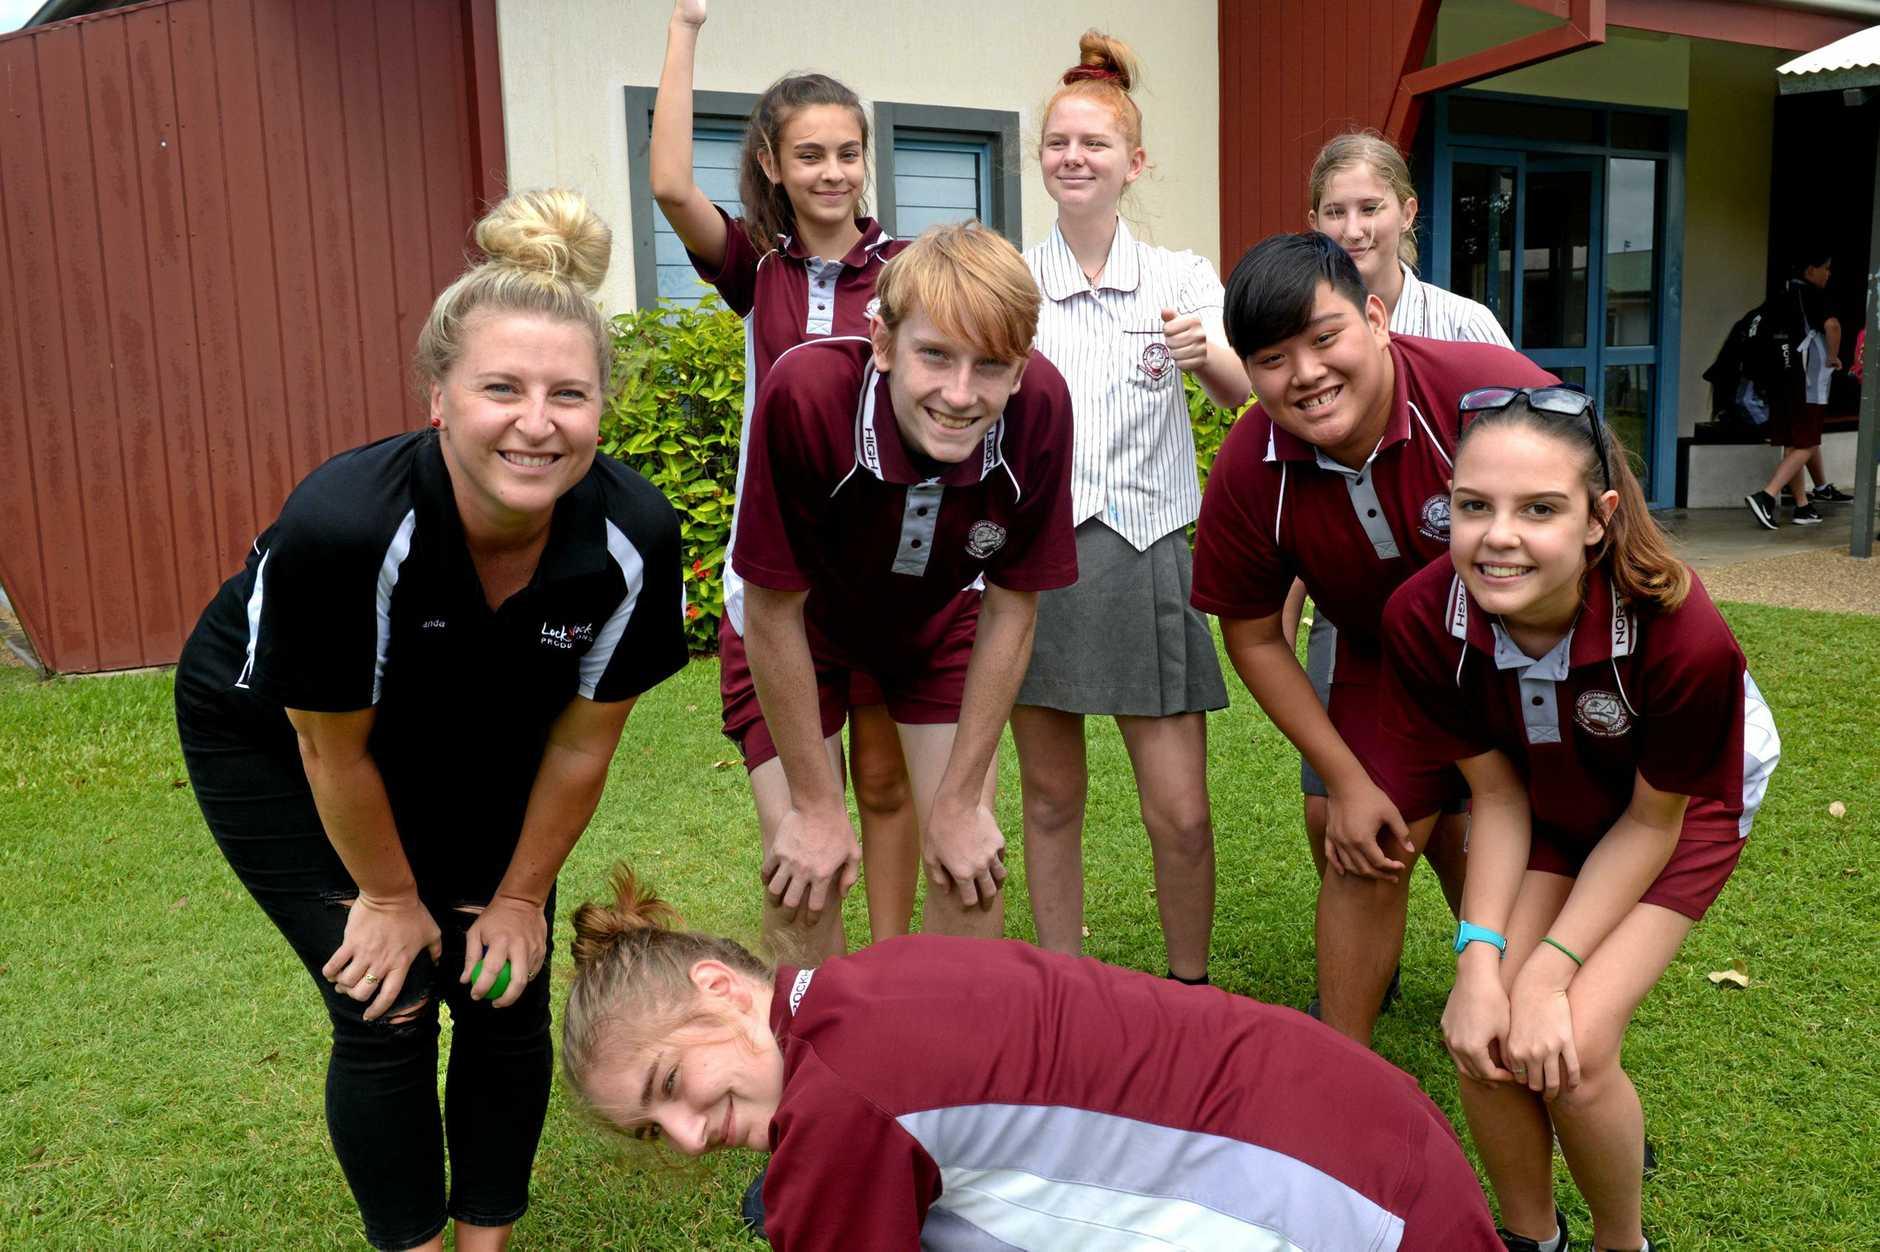 Amanda Locker, Emily Unwin, Jack Coote, Ashleigh Nicholson, Chelsea Schmidt, Huy Nguyen, Daenera Sealey and Aleyra Turnley-Dau at North Rockhampton High School.